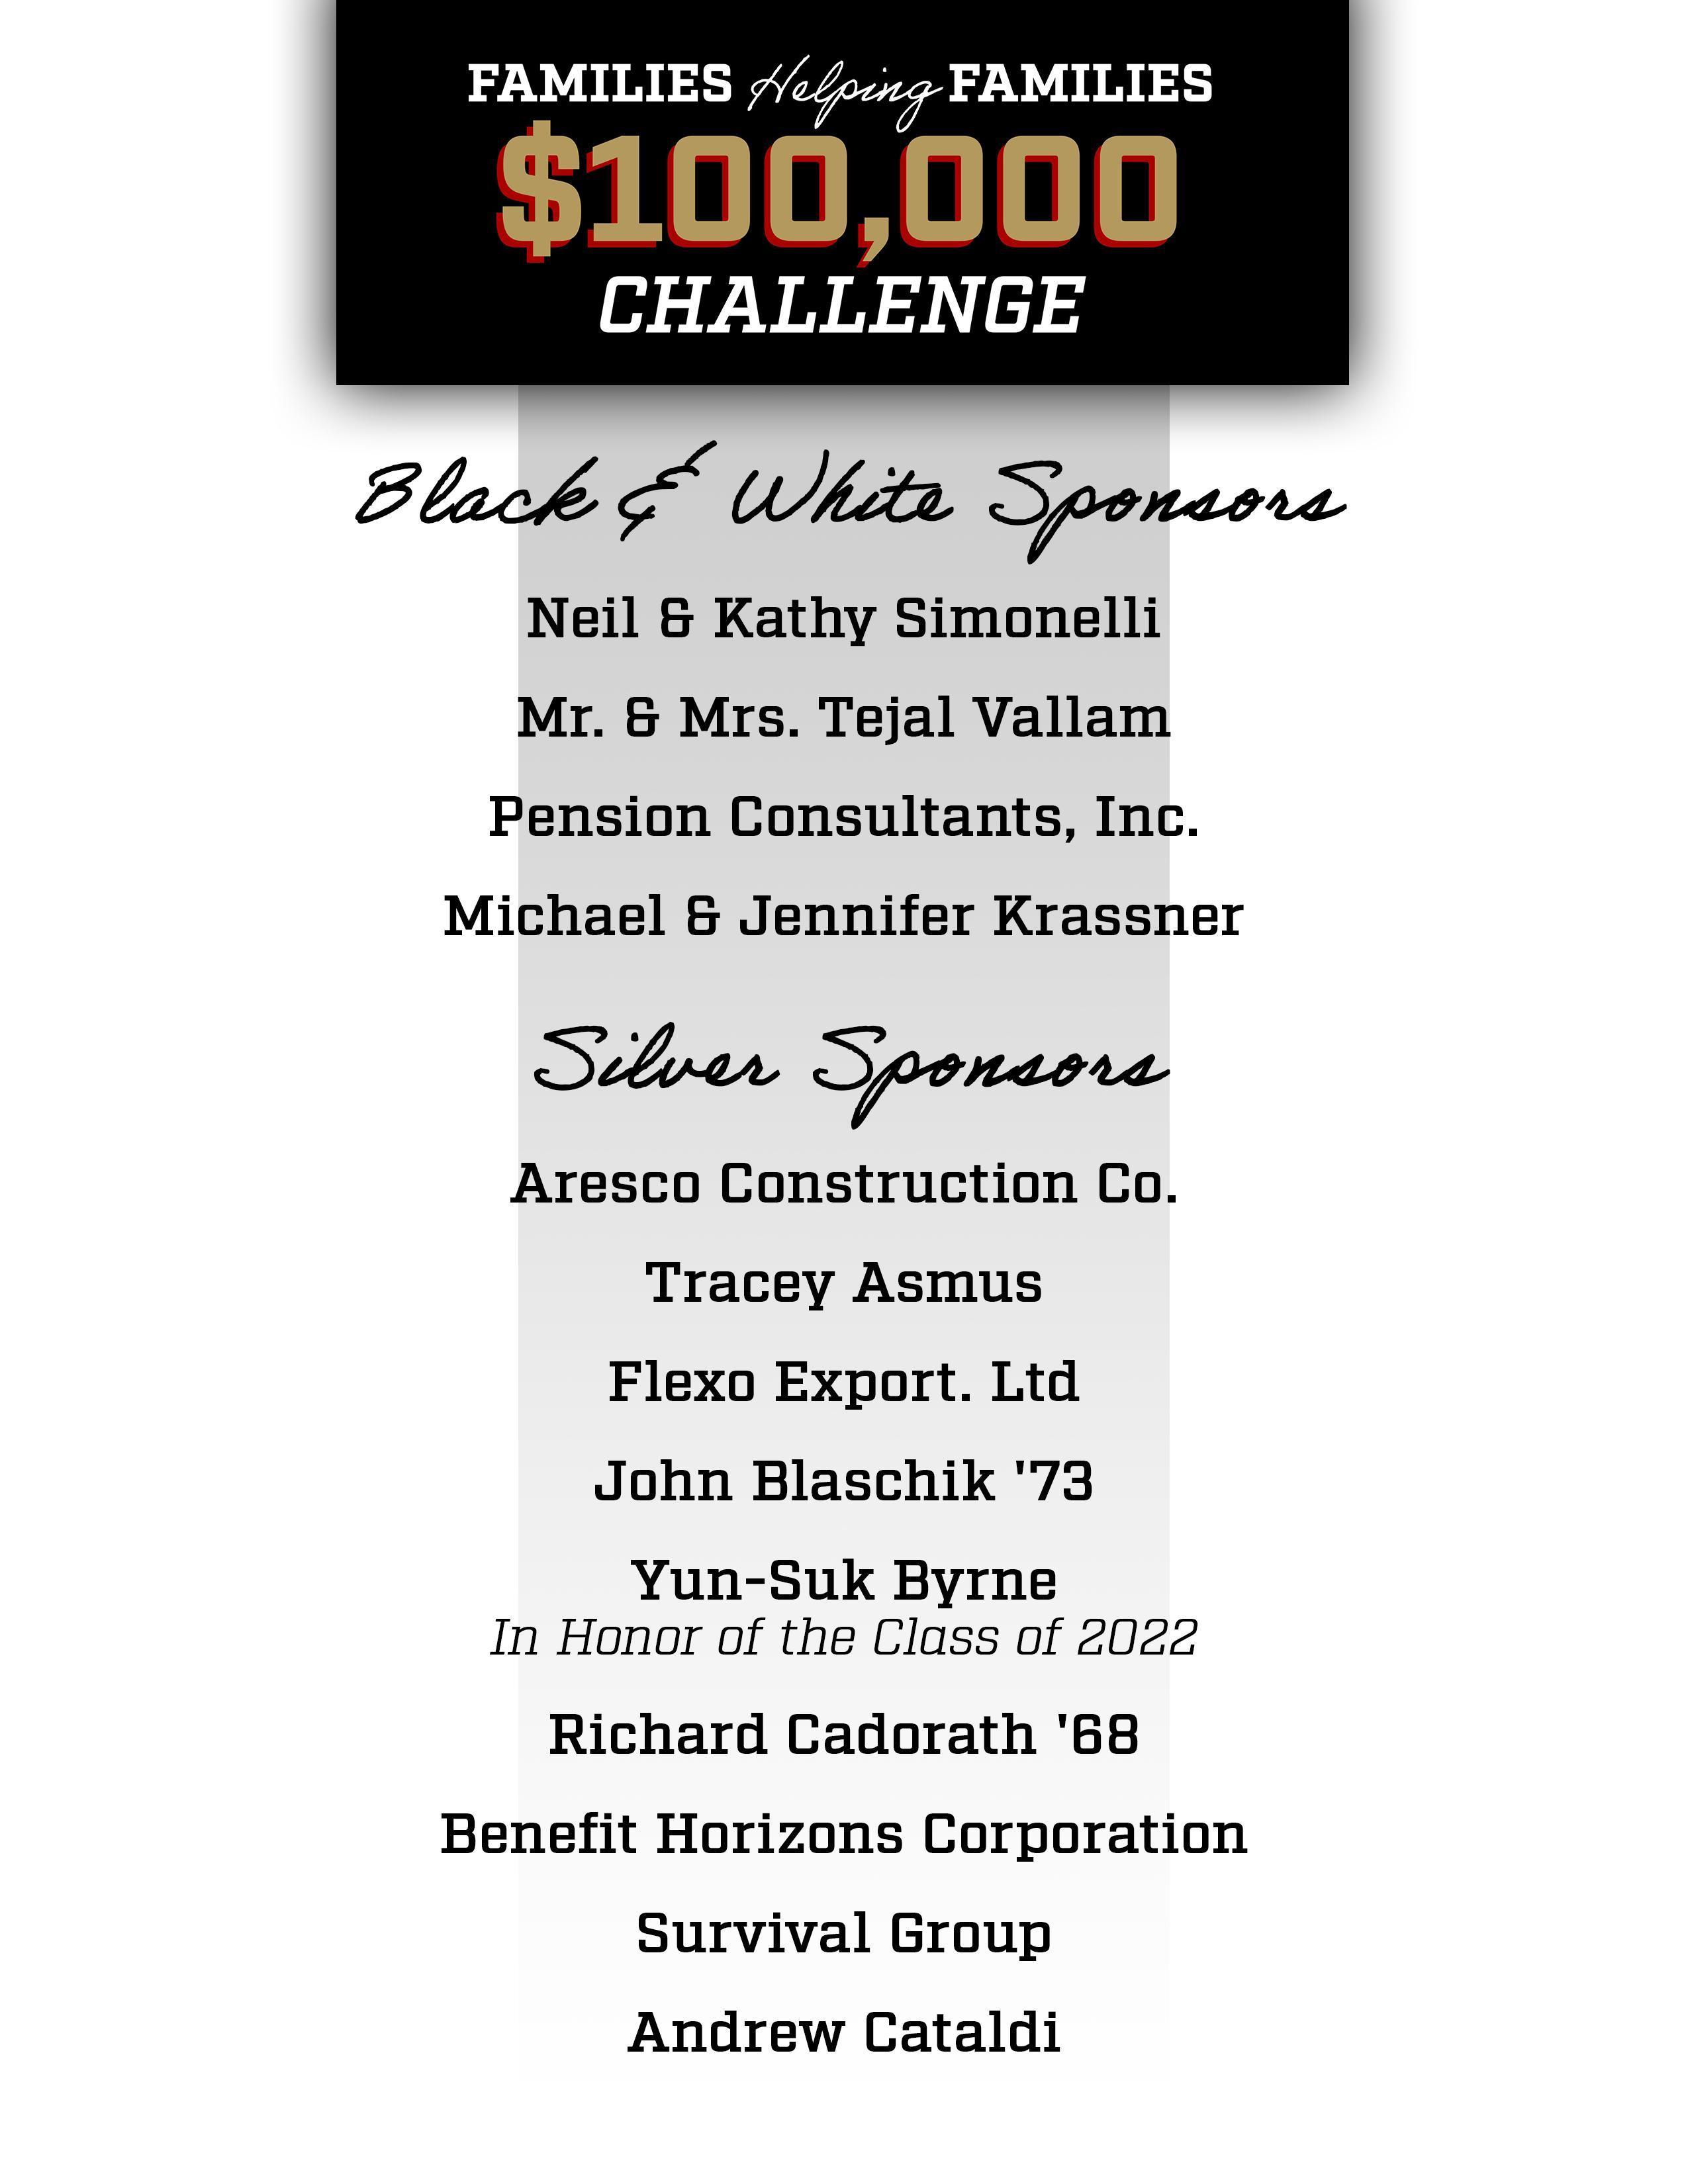 FHF Sponsors for $100,000 Challenge